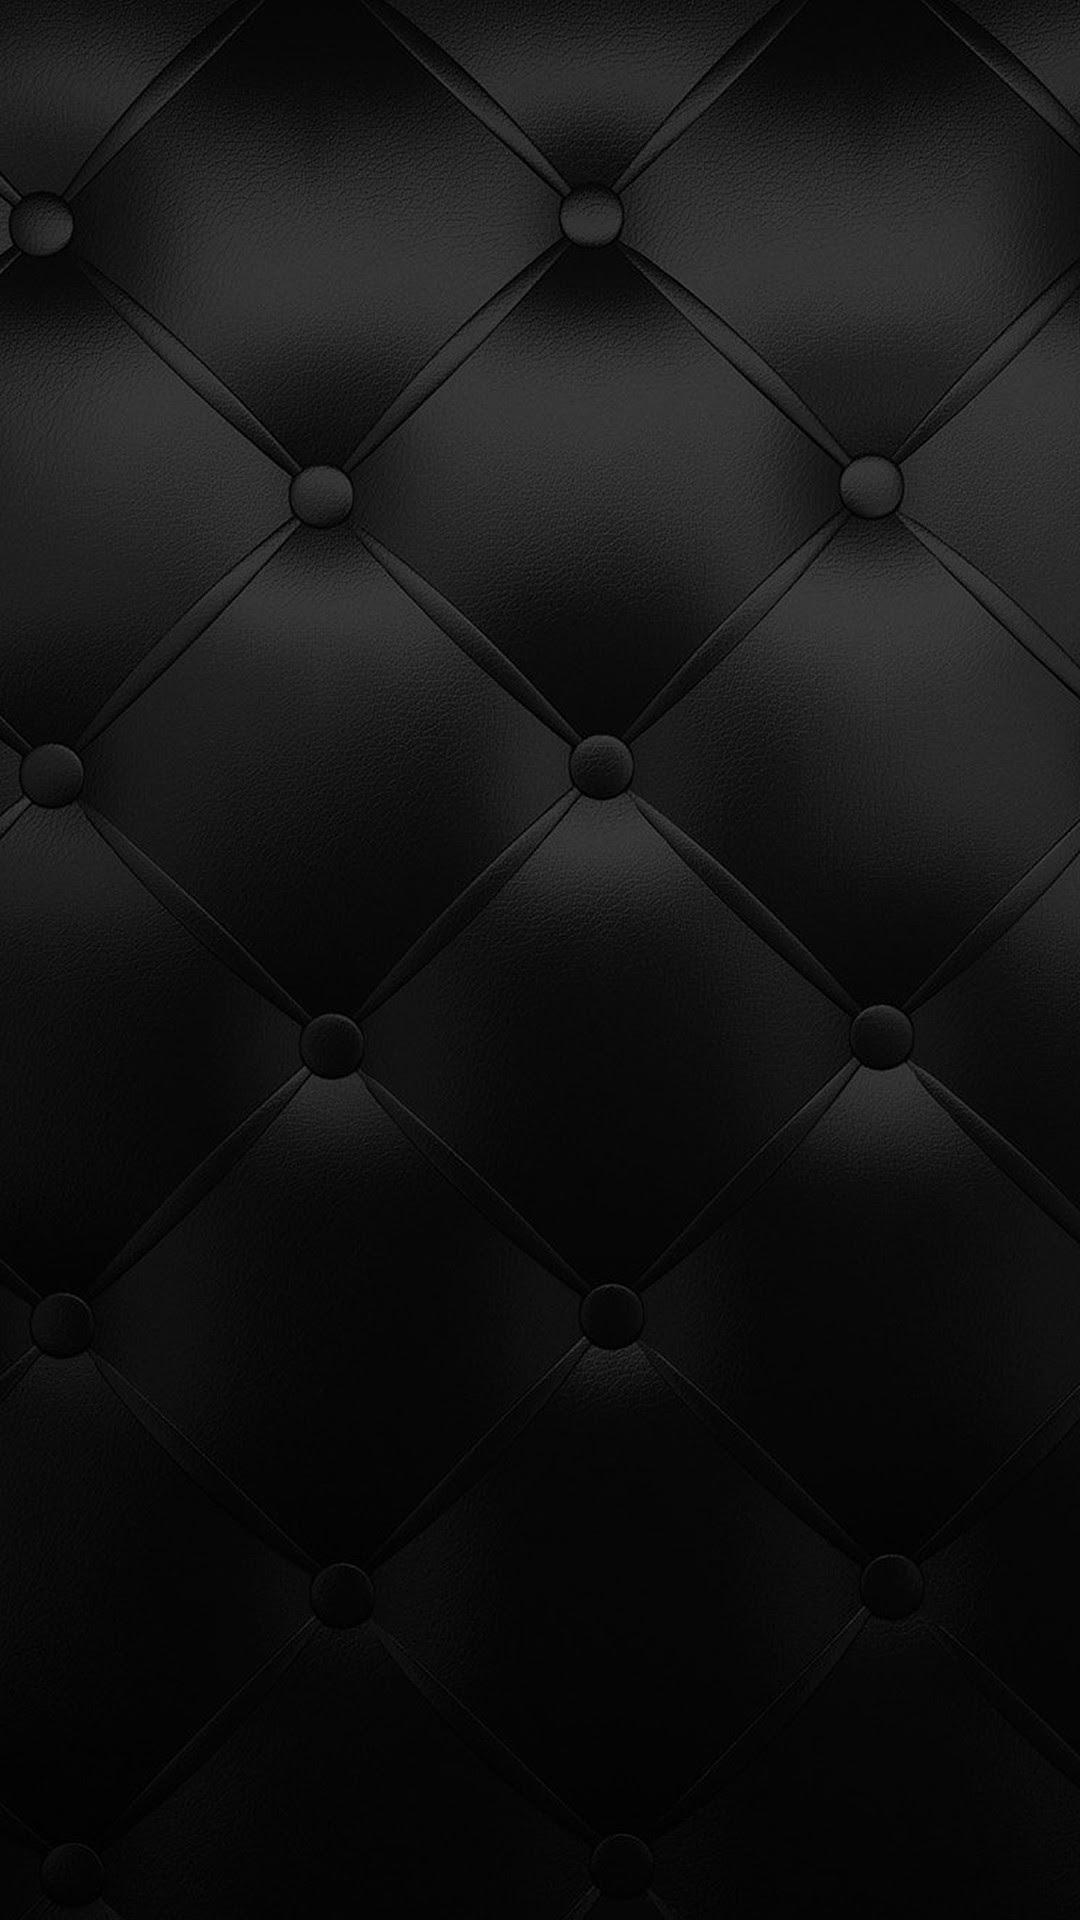 Iphone 6 Home Screen Wallpaper Black Homelooker